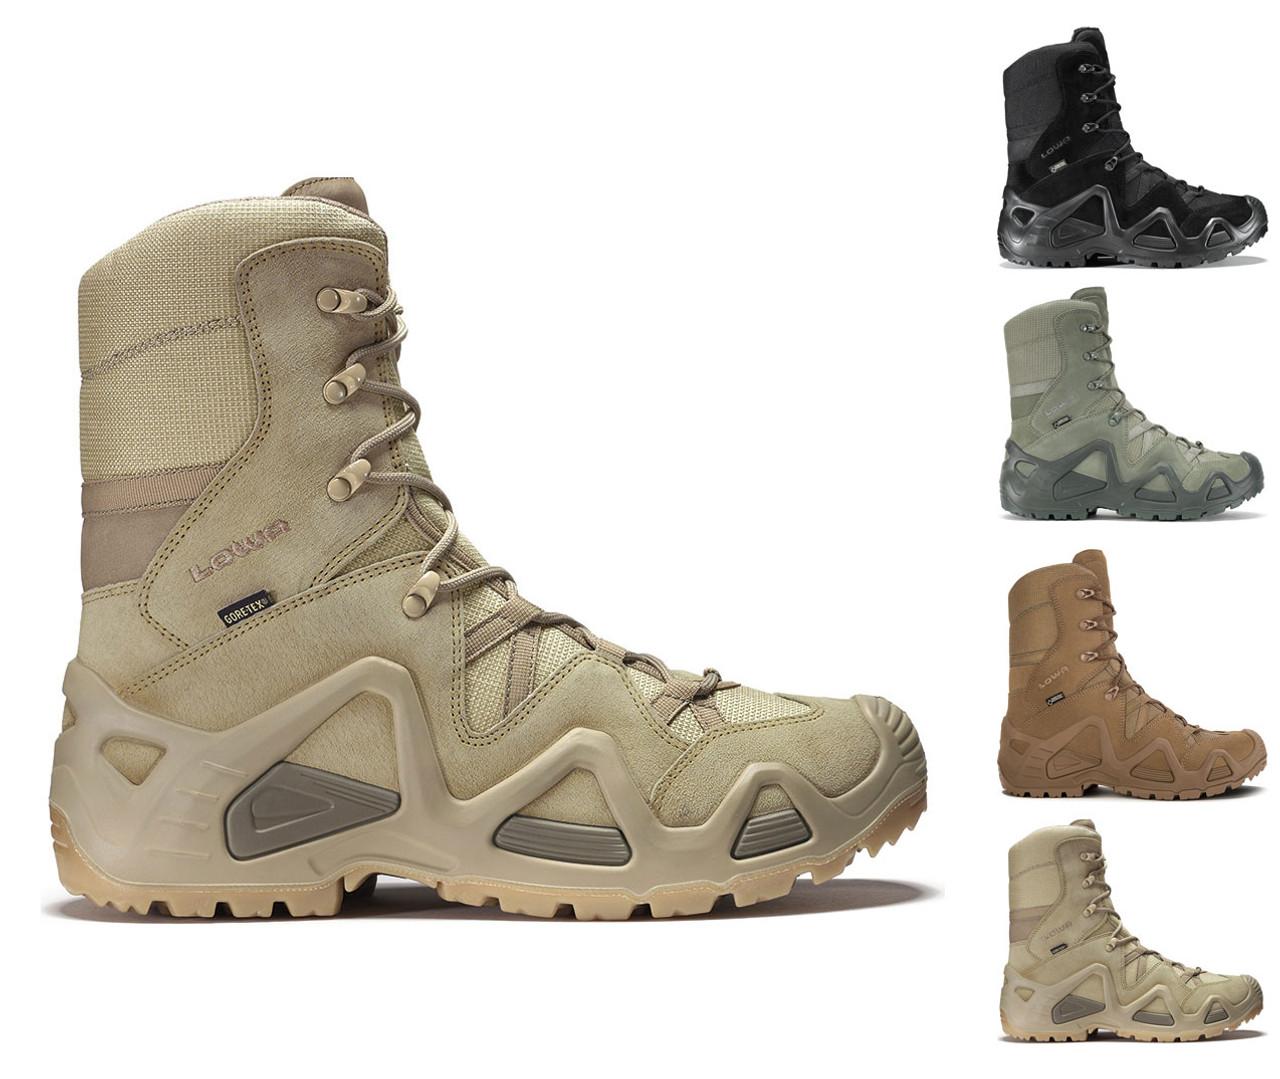 Lowa Men's Zephyr GTX Hi TF Boots